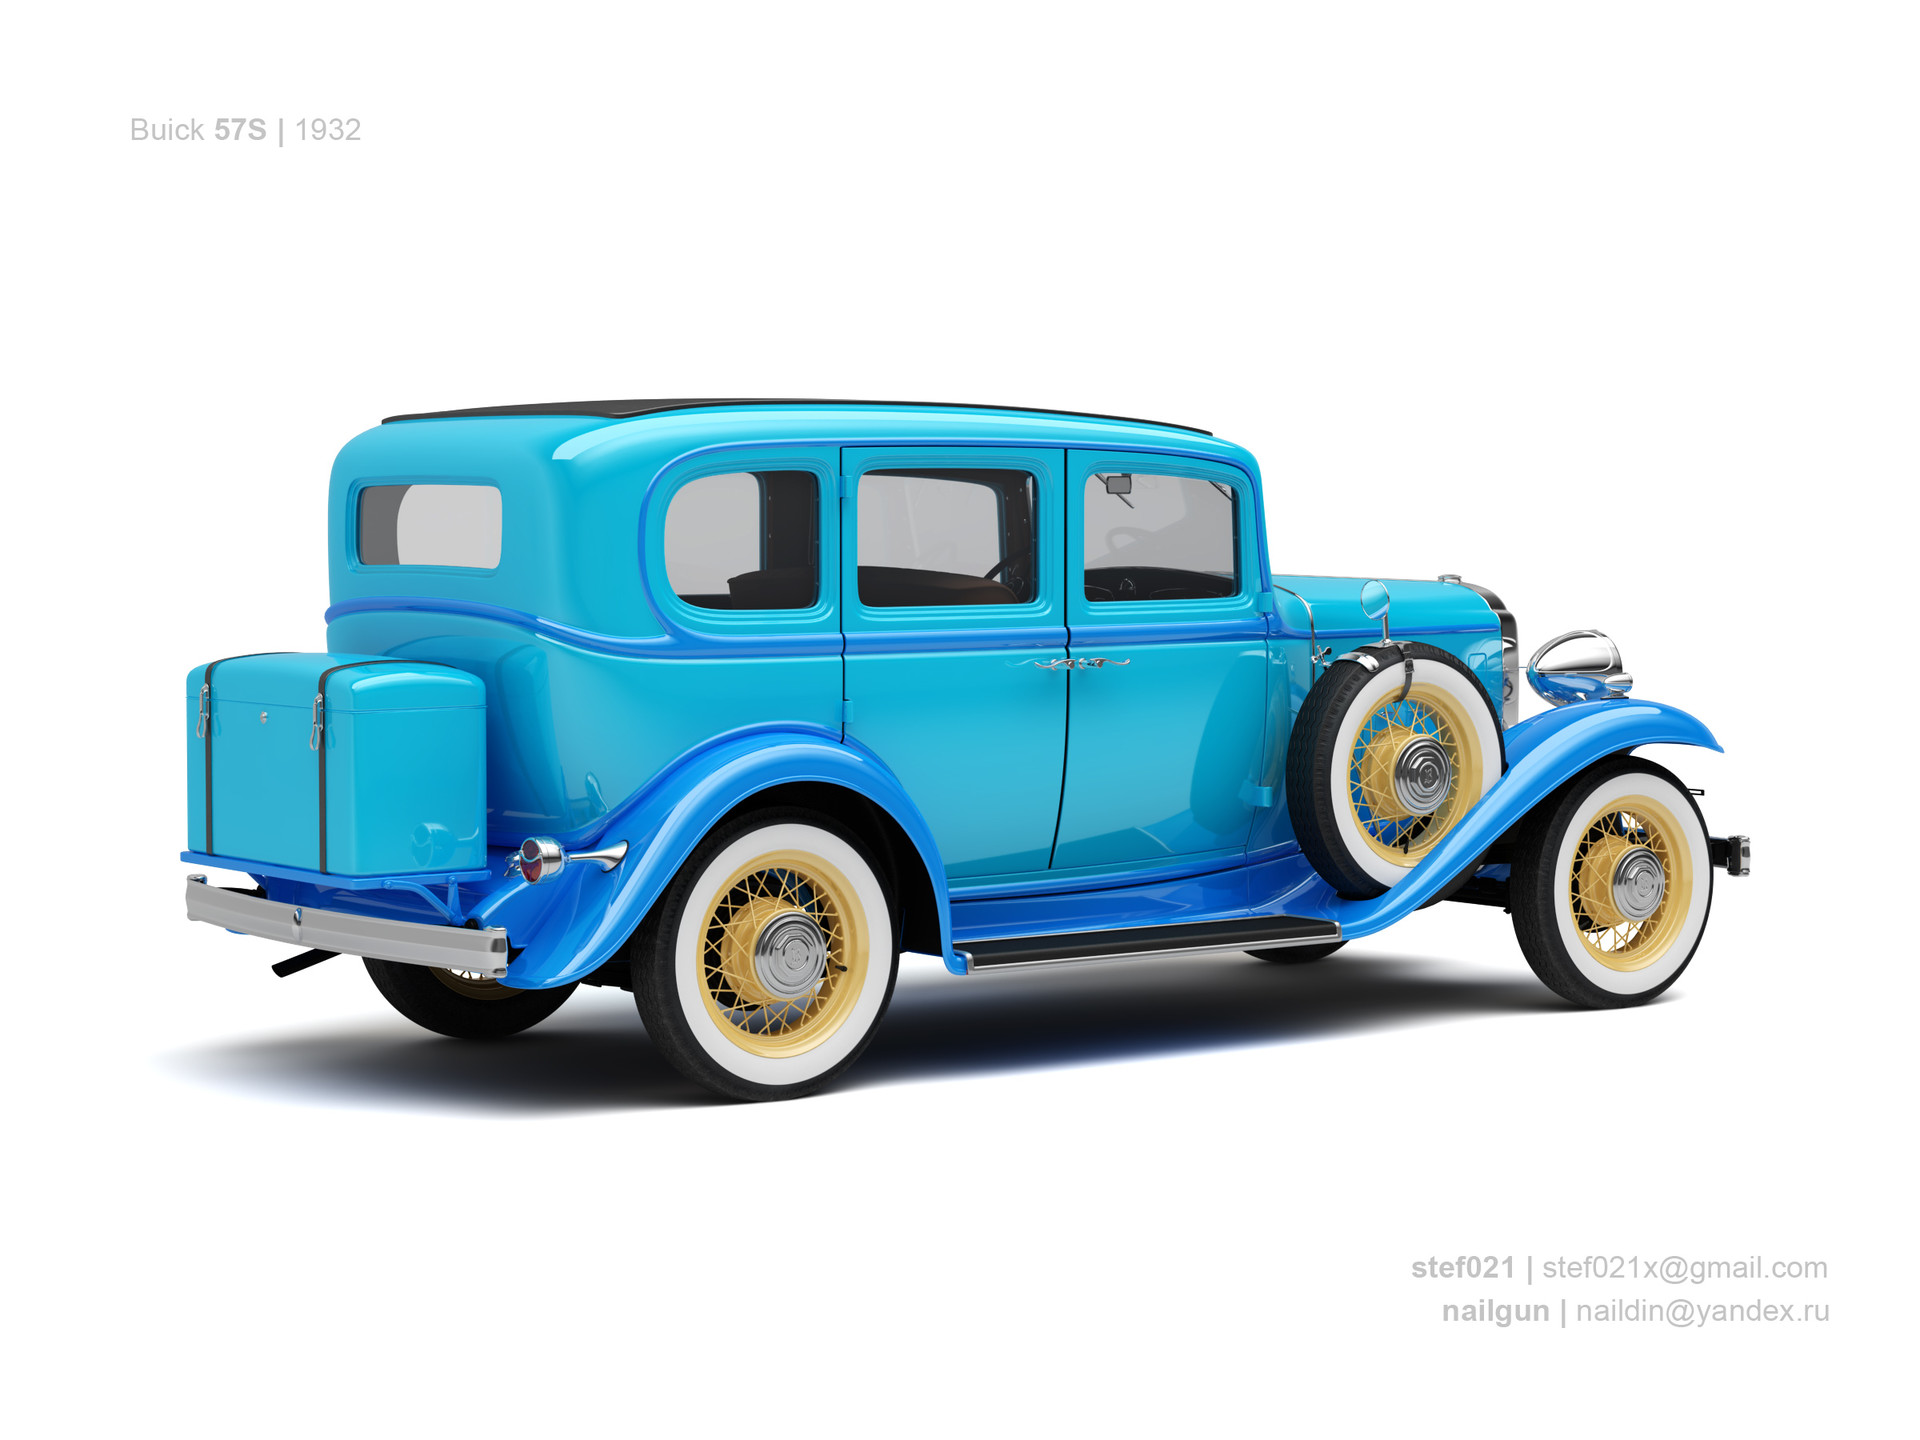 Nail khusnutdinov usa buick 57s 1932 1